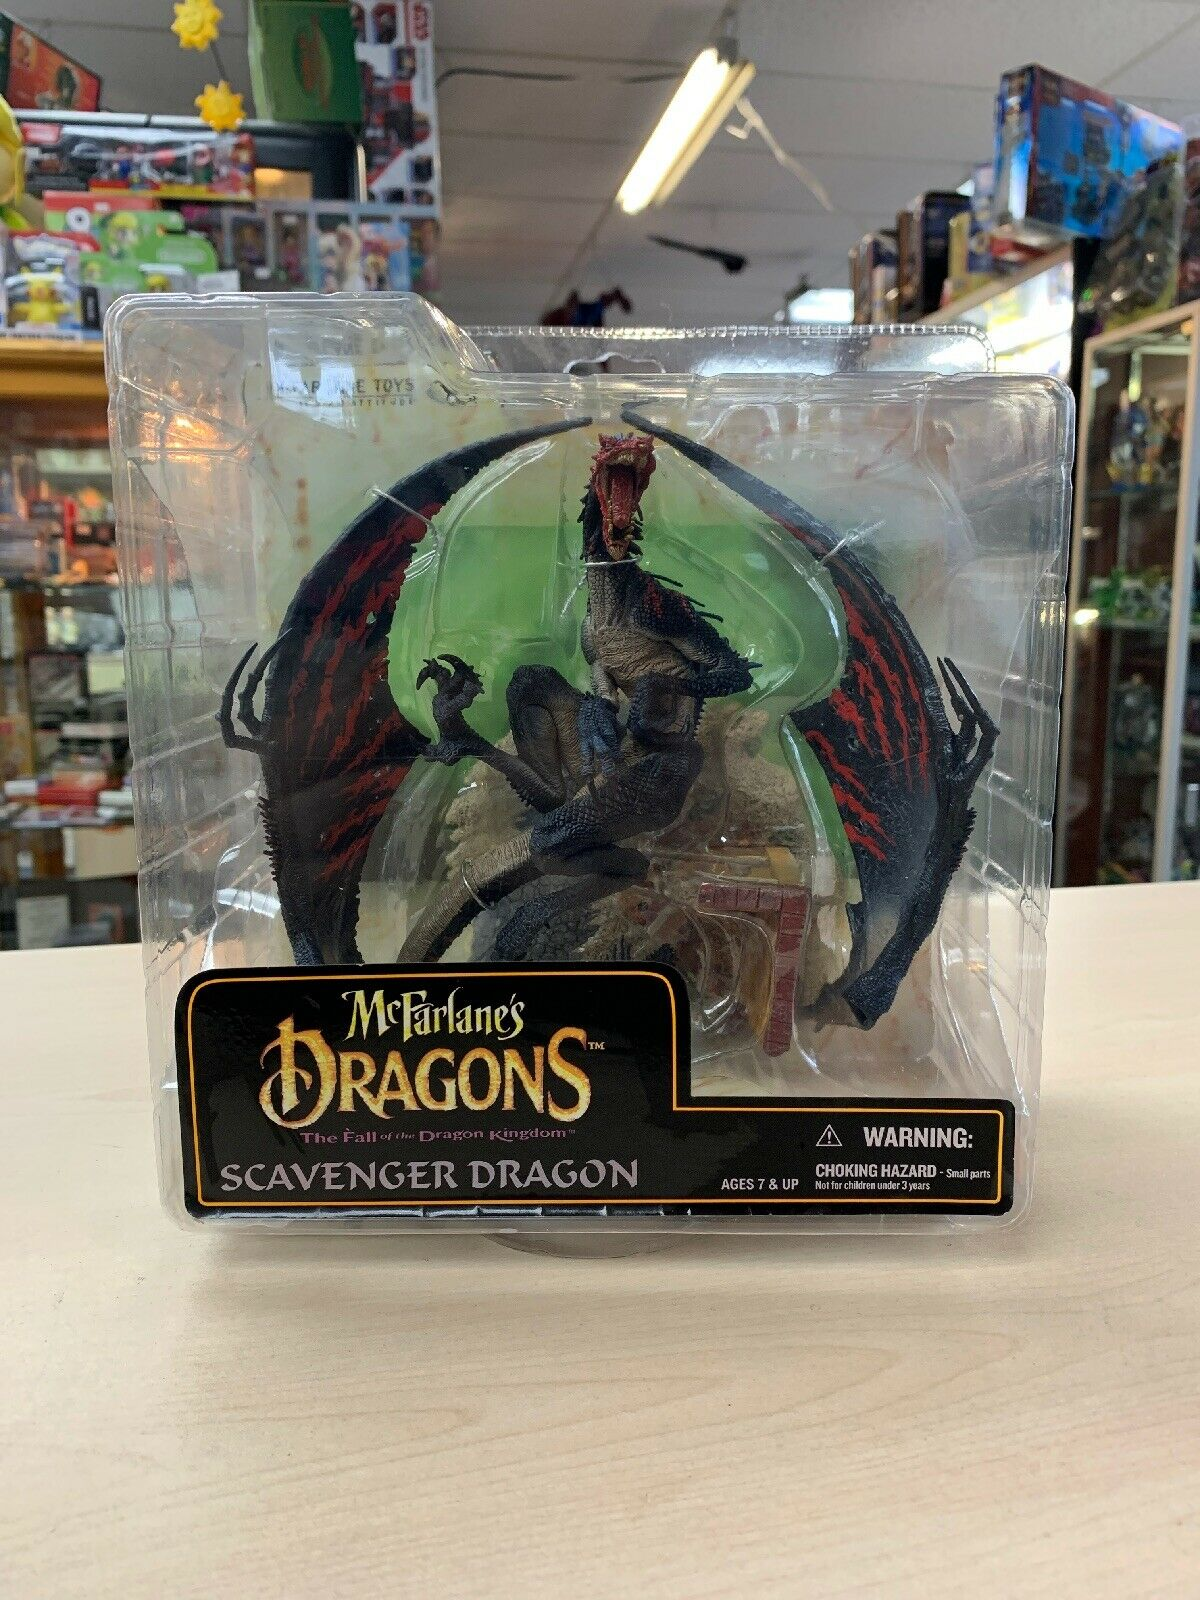 McFarlane's Dragons  Scavenger Dragon The Fall of the Dragon Kingdom A25